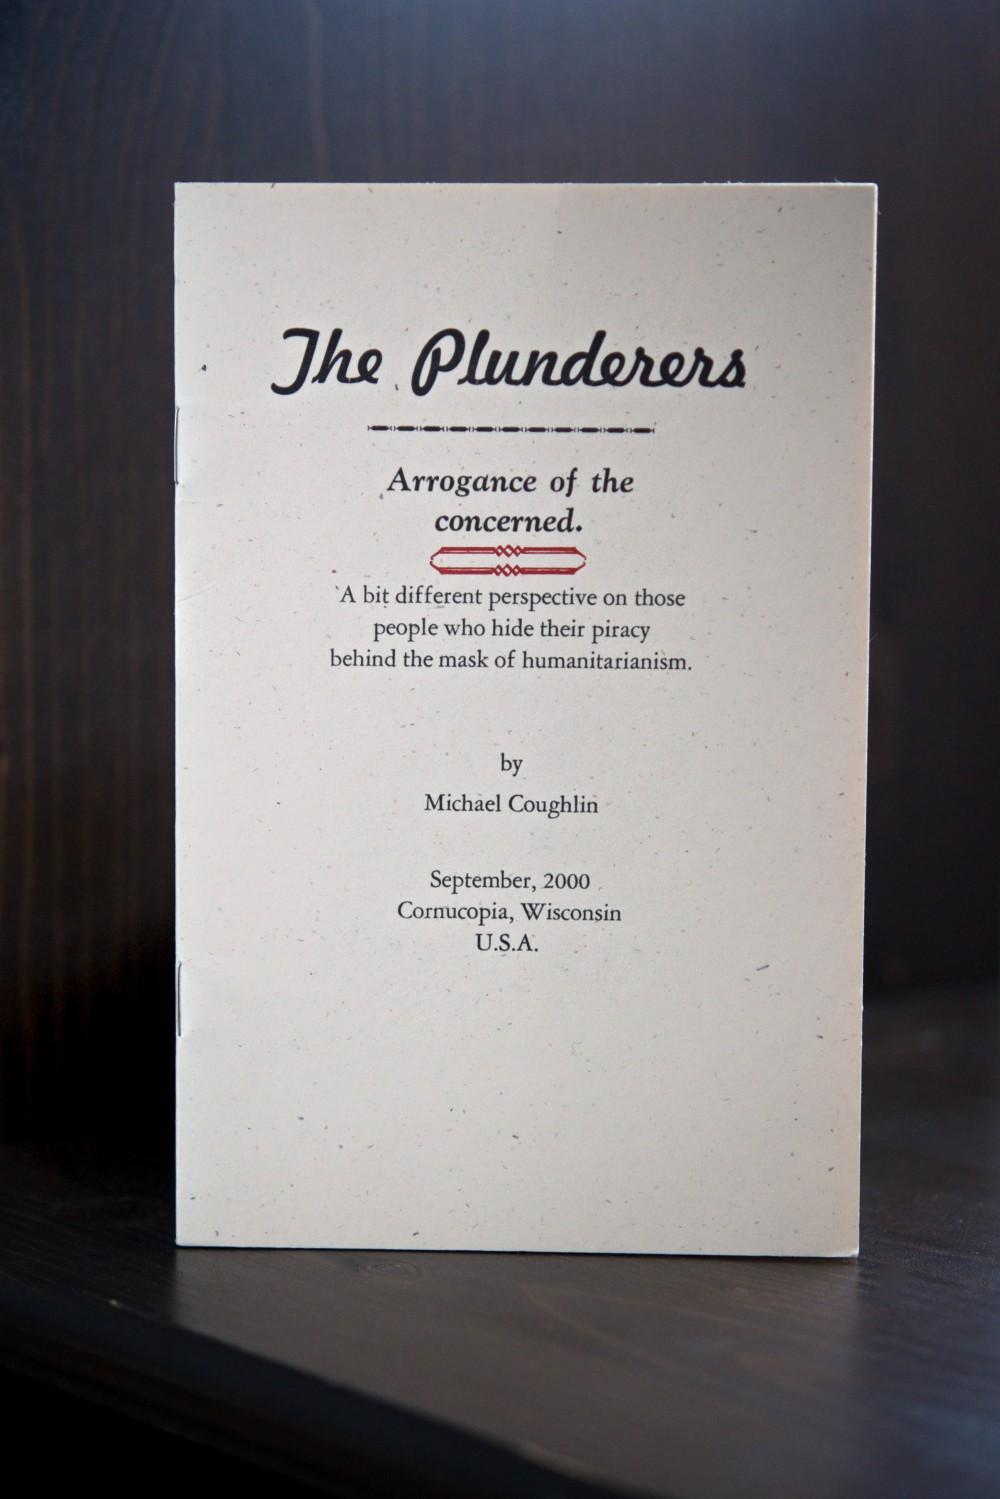 The Plunderers letterpress pamphlet